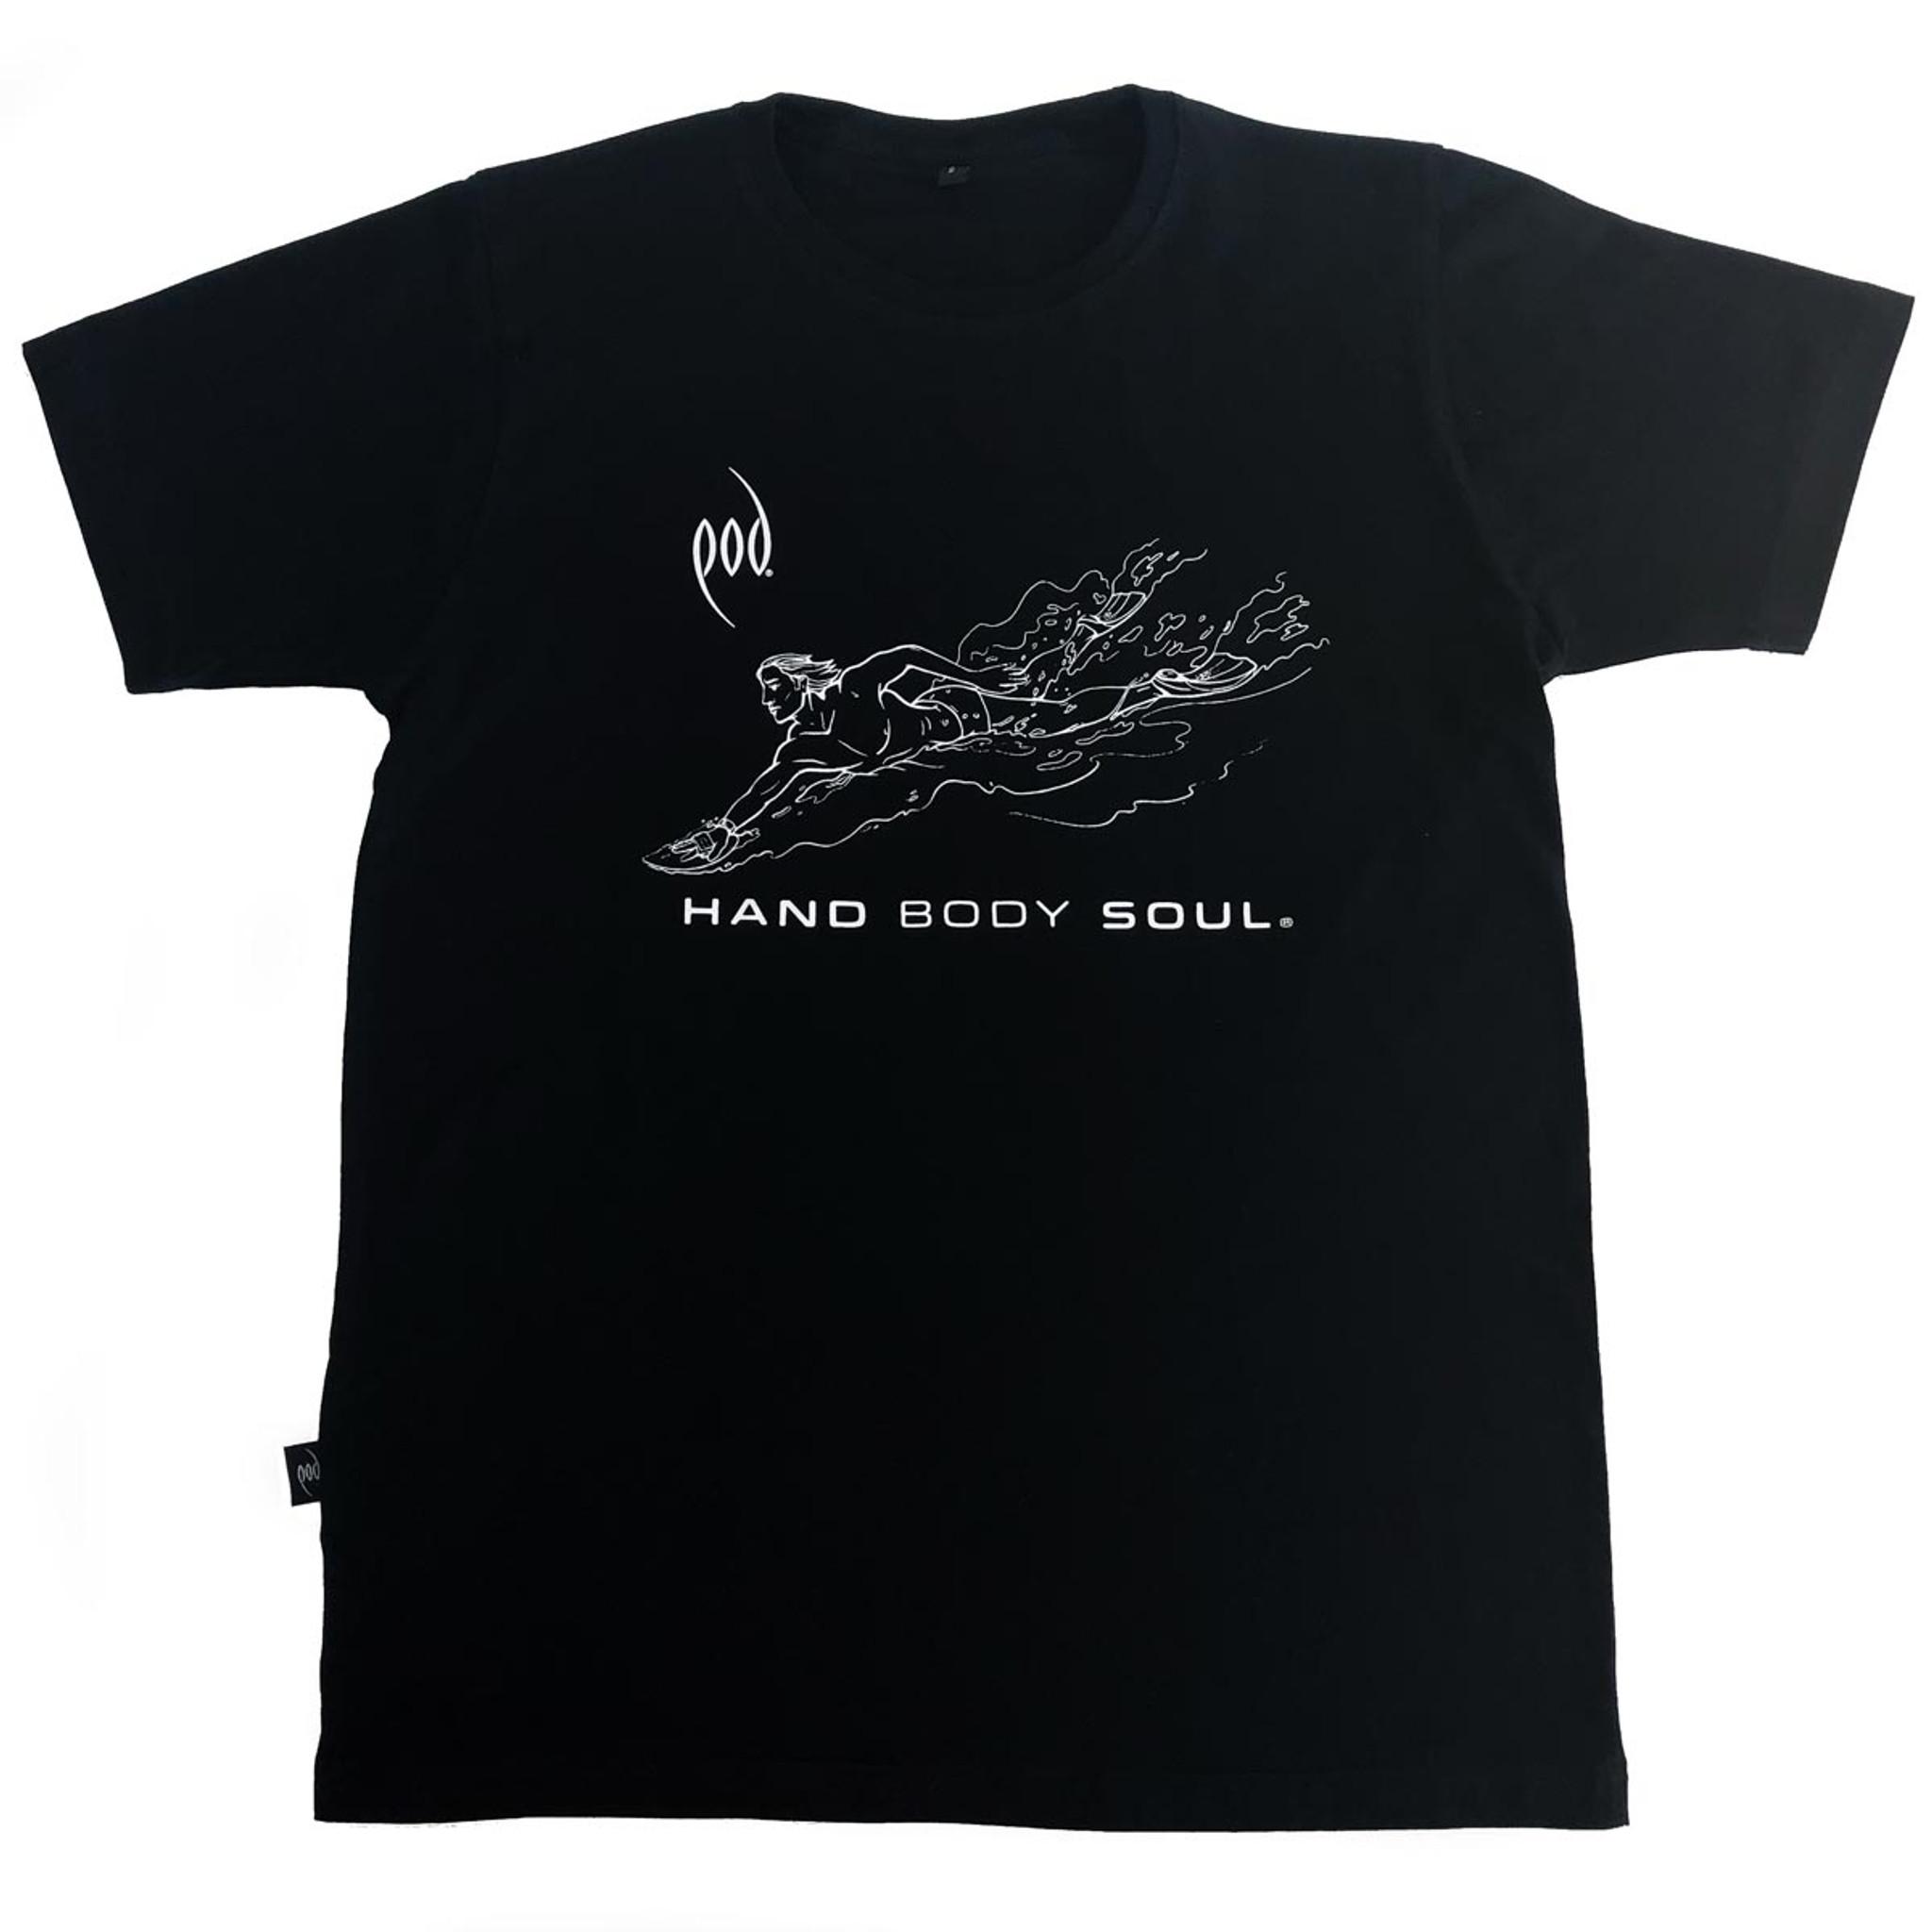 POD Hand Body Soul Bodysuring T-Shirts